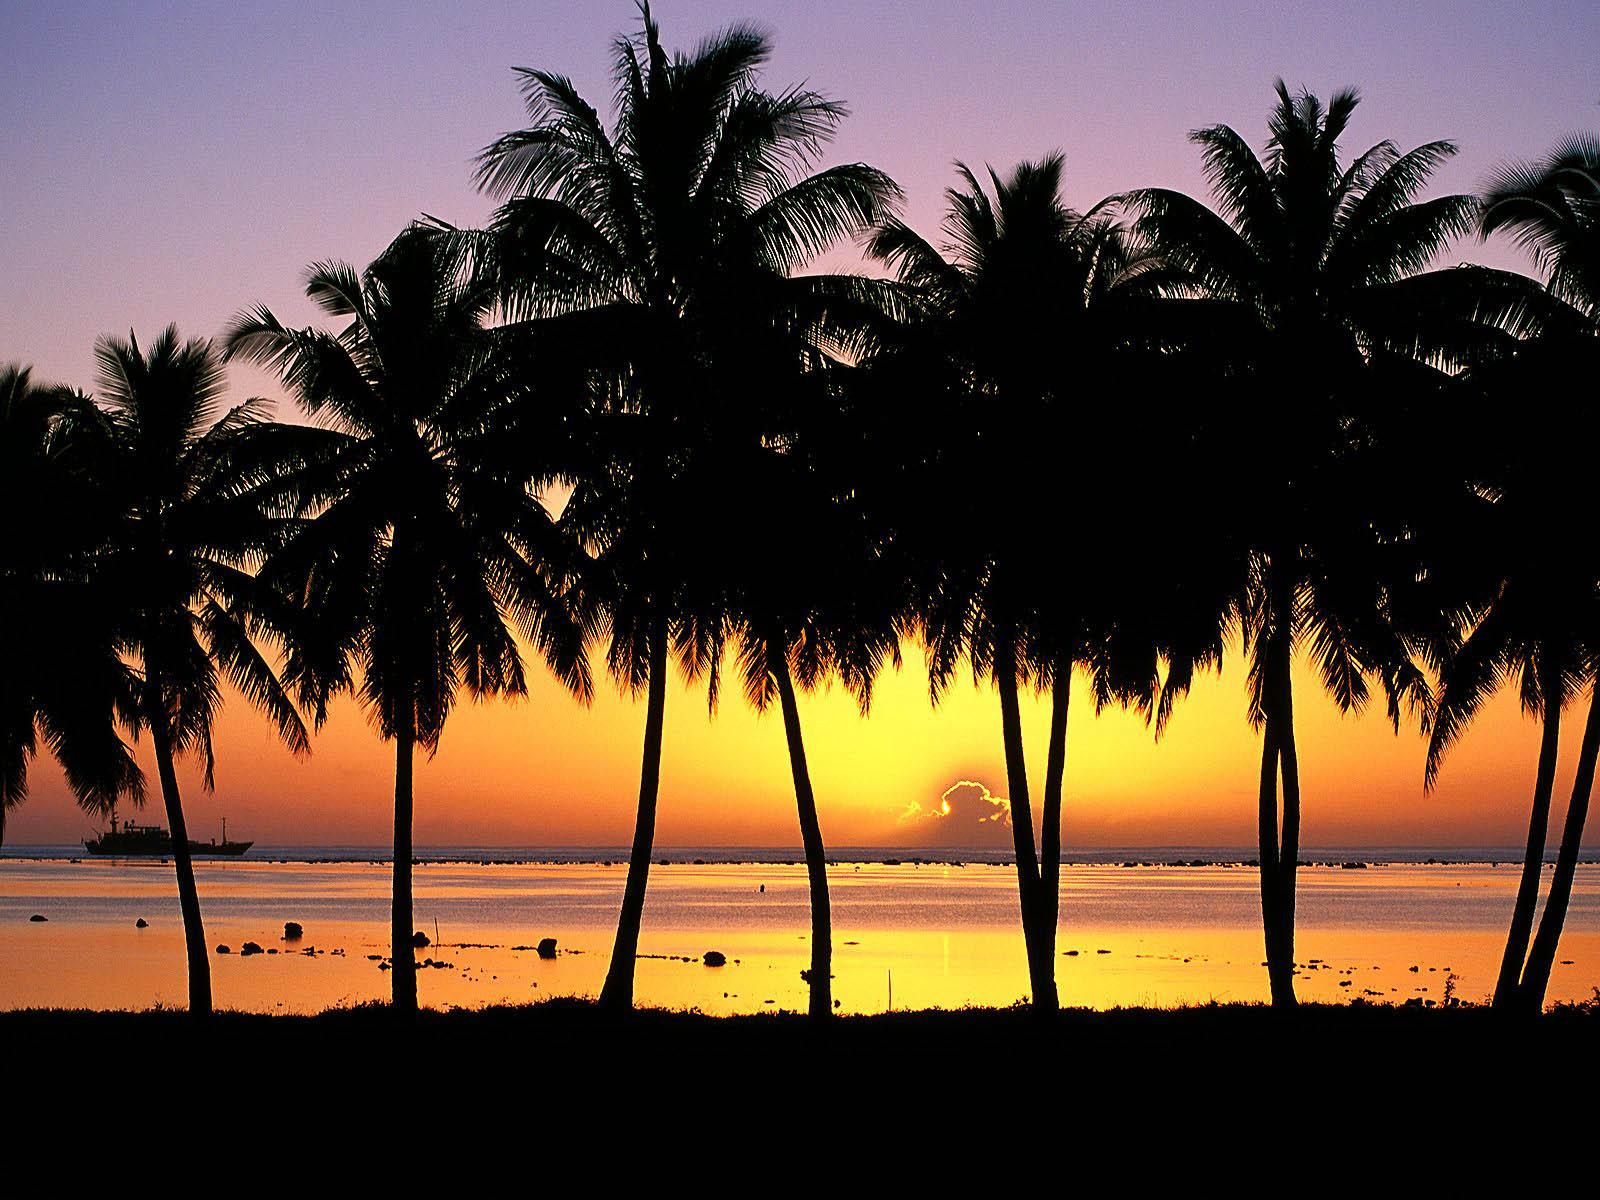 tropical sunset palm tree - photo #2